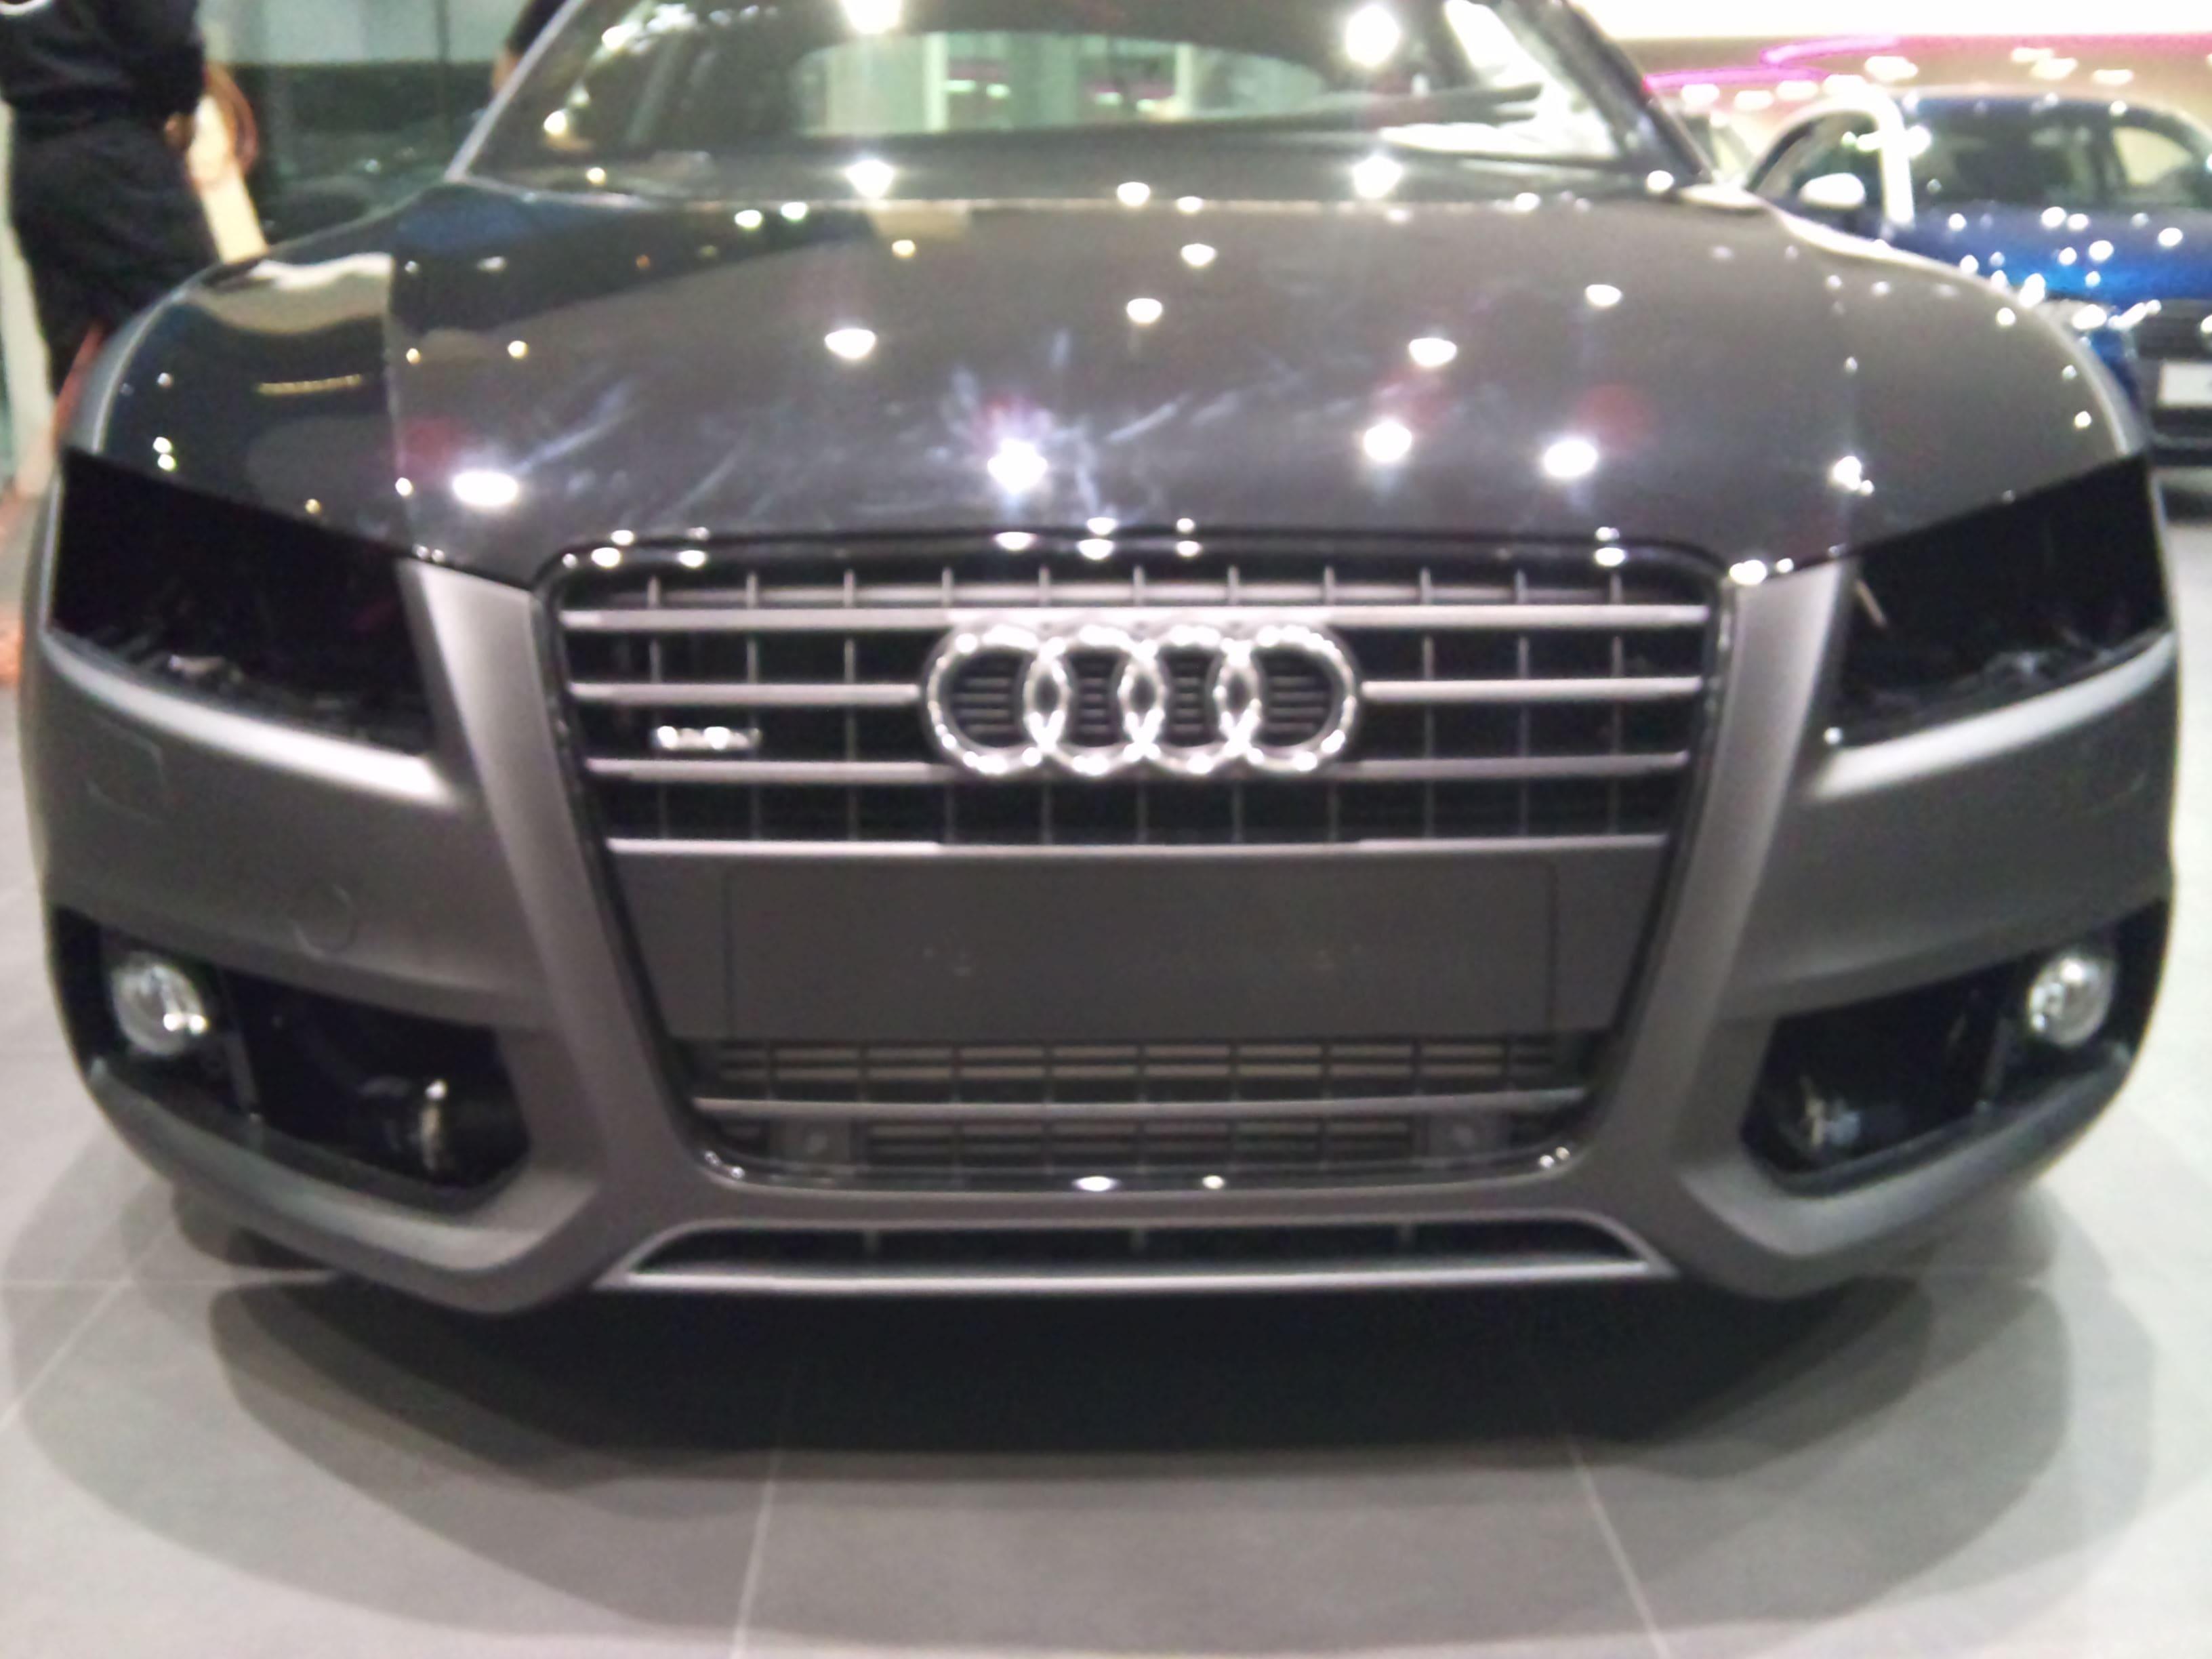 Audi A5 Coupe met Mat Zwarte Wrap, Carwrapping door Wrapmyride.nu Foto-nr:4556, ©2021